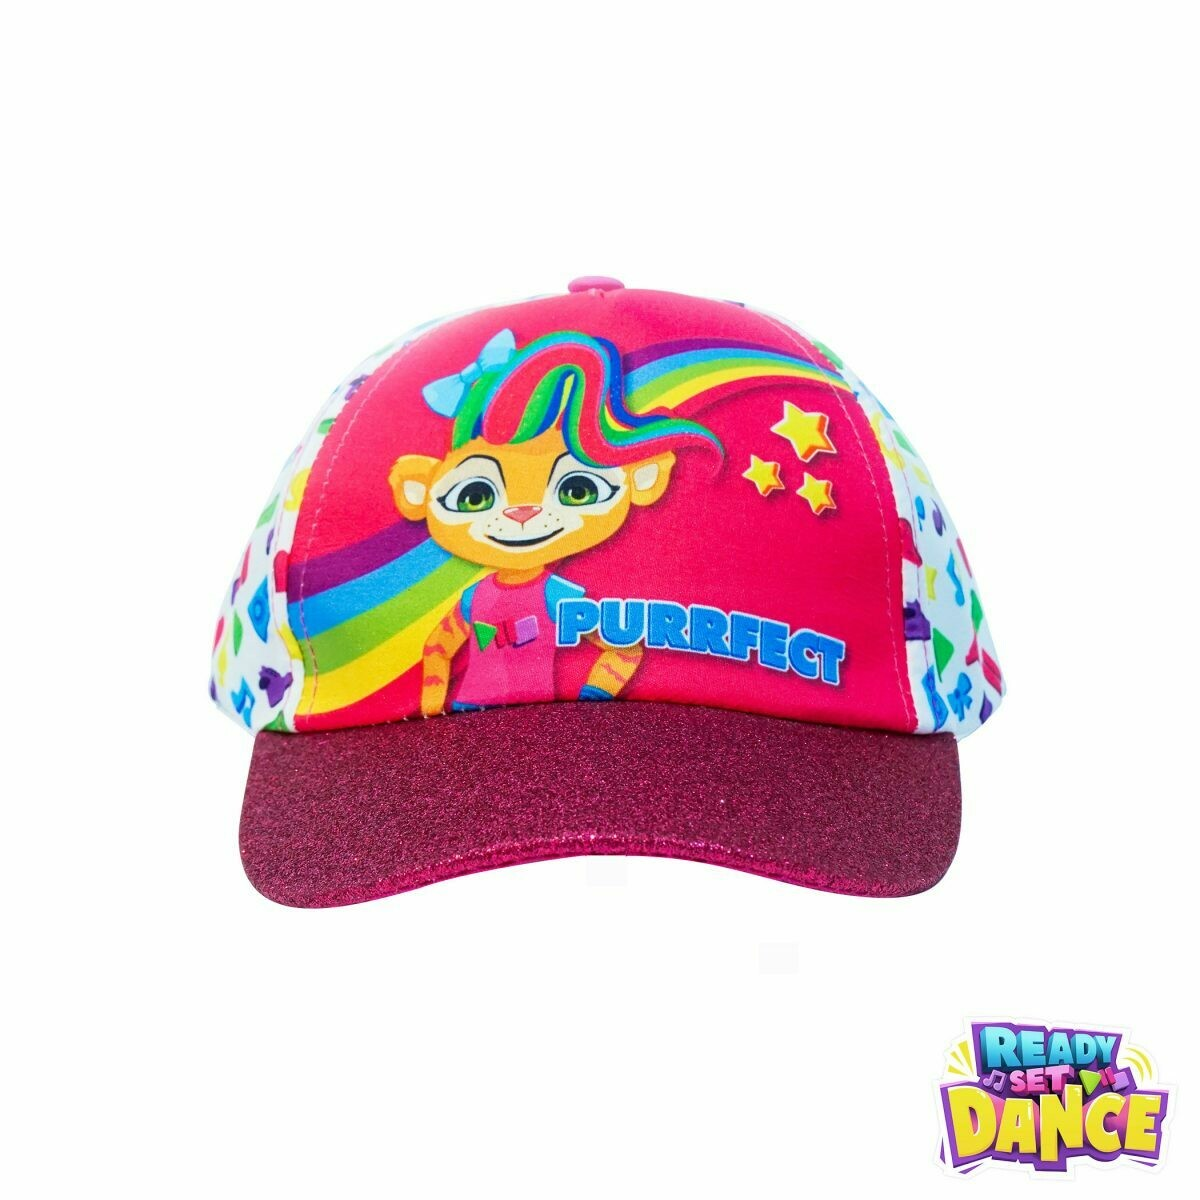 READY SET DANCE - Twirl Cap